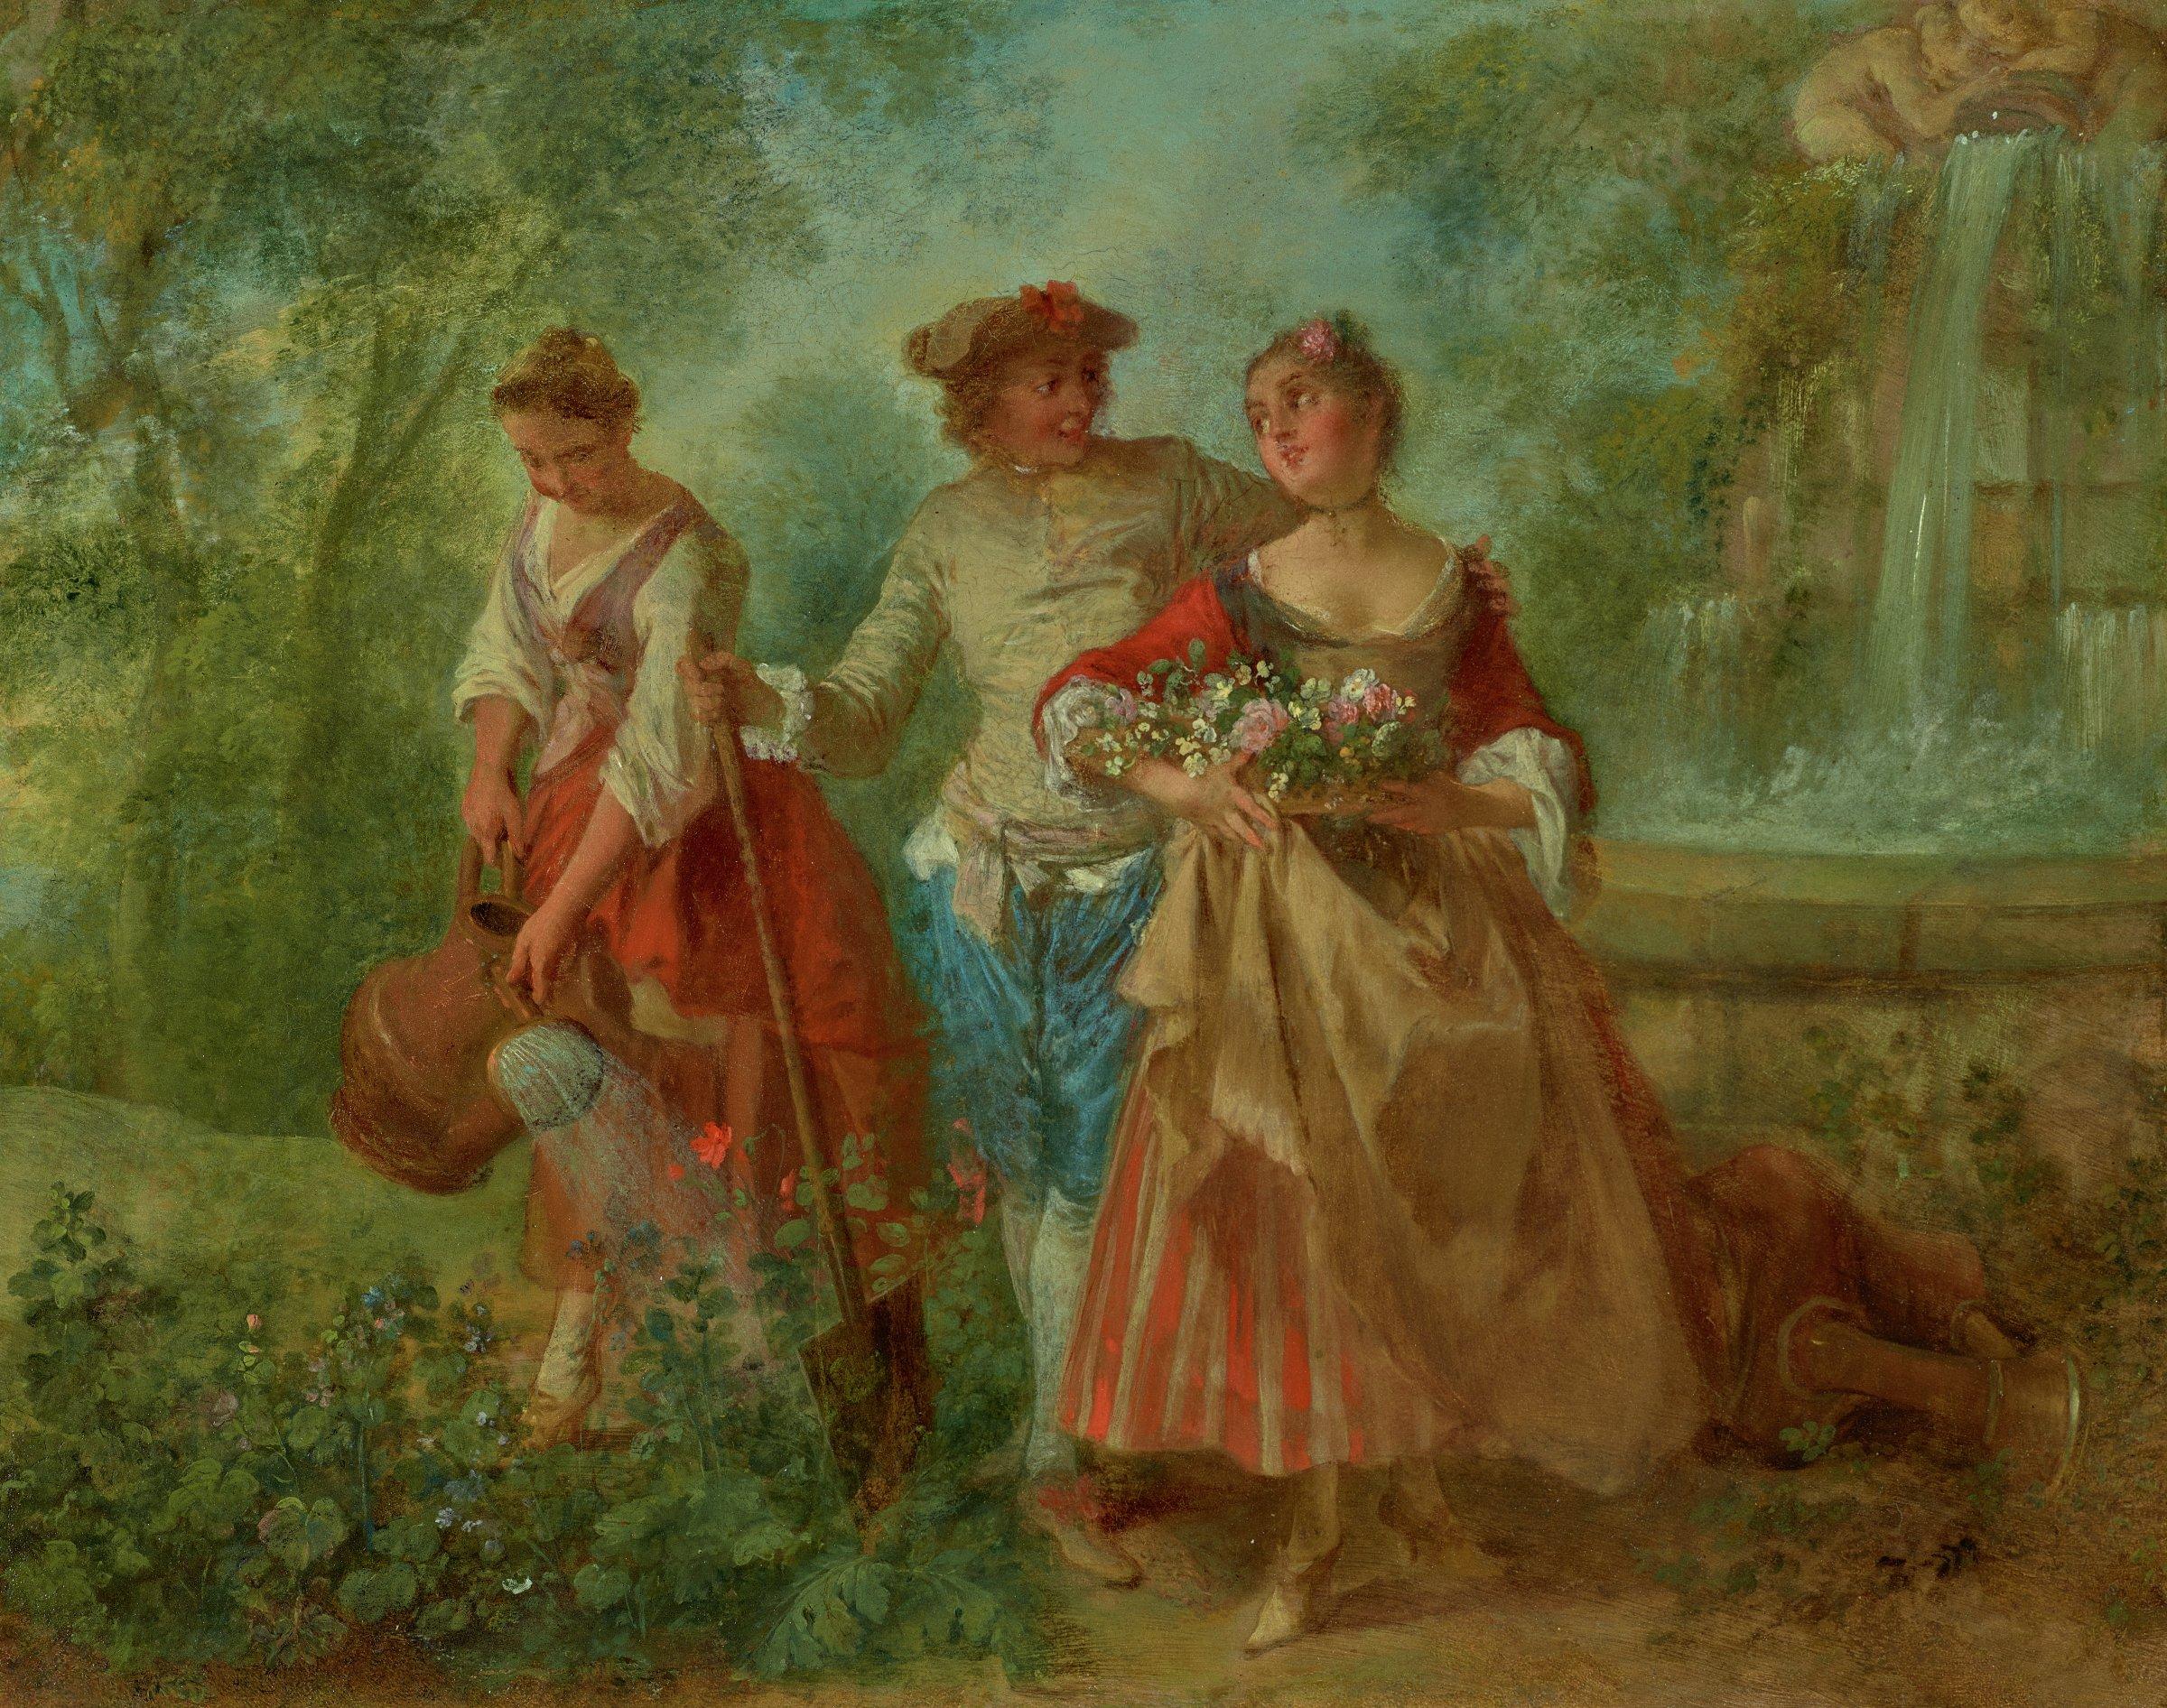 Allegory of Spring, Nicolas Lancret, oil on copper